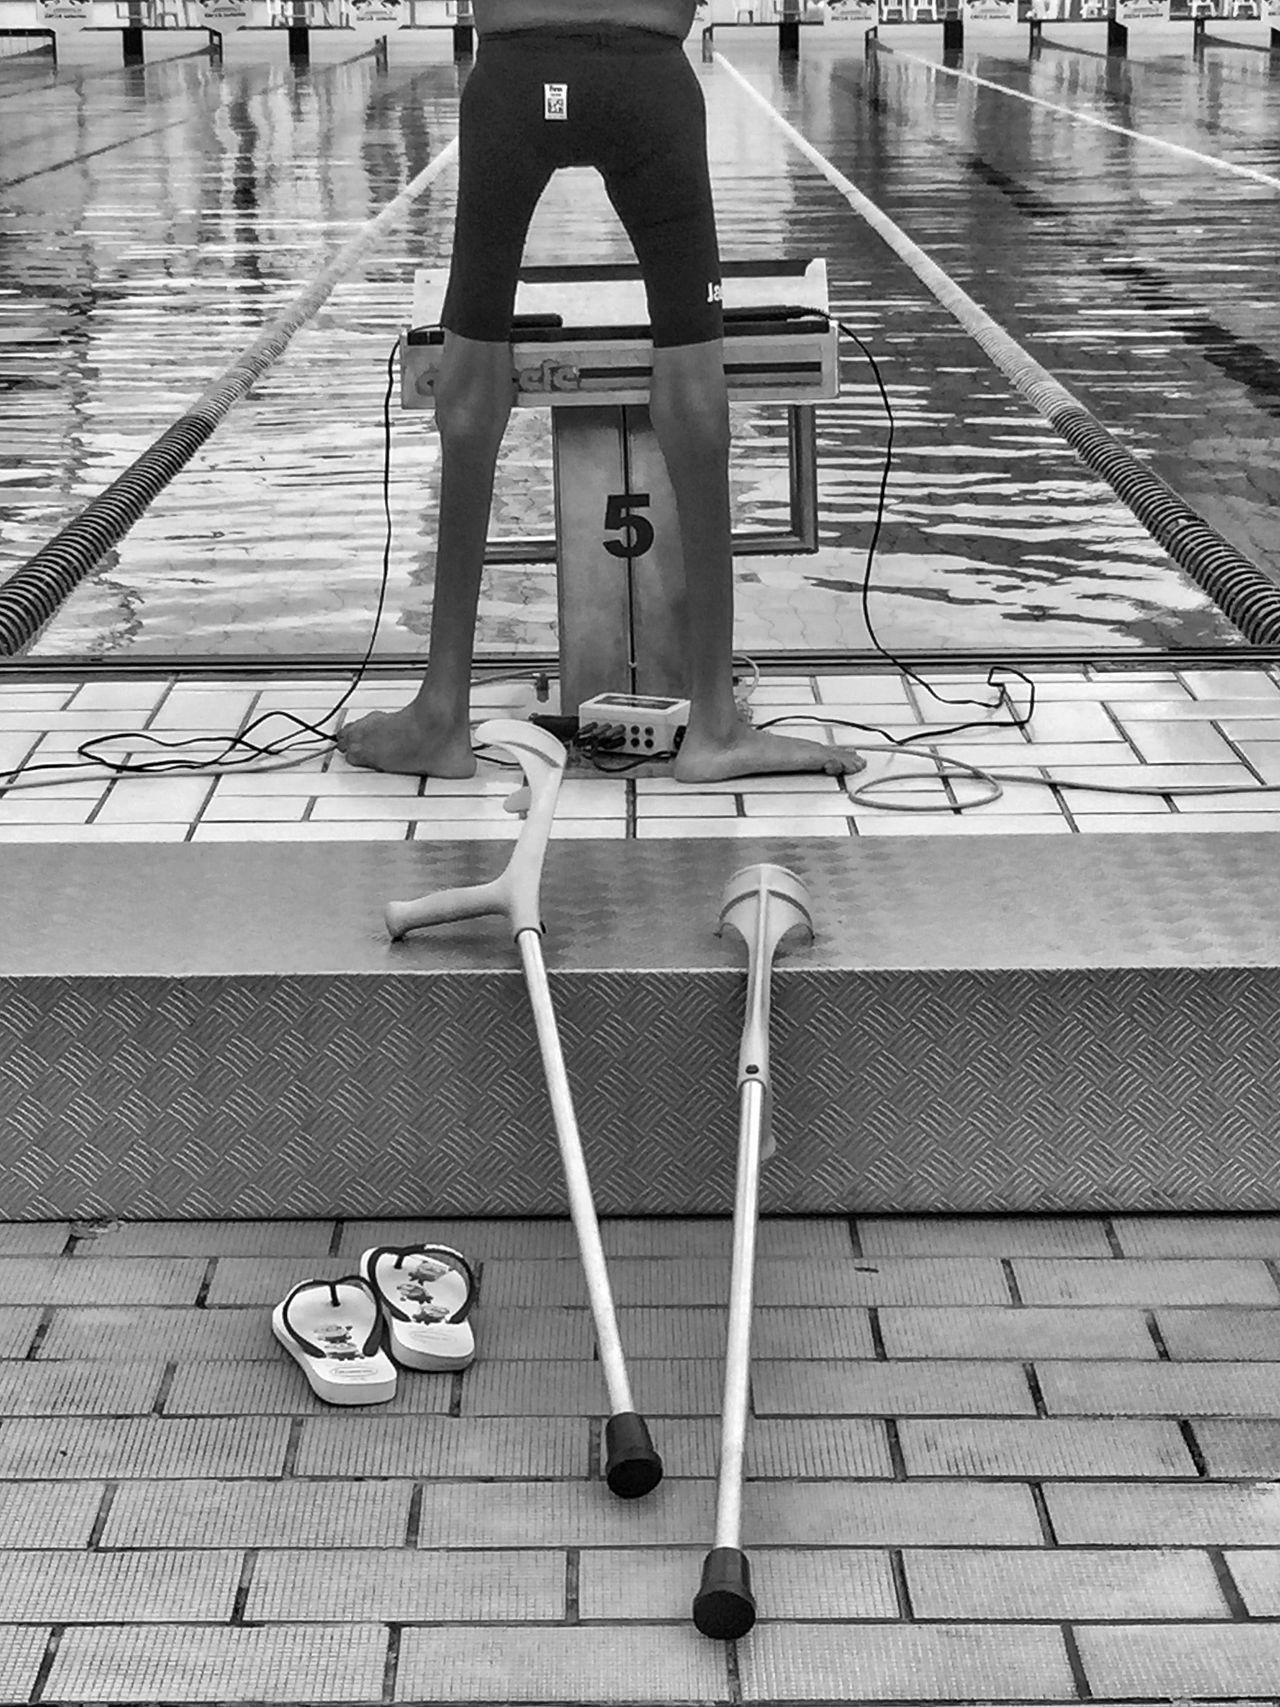 Paralimpic Games Paralimpics Superação2016 Esporte Paralimpico